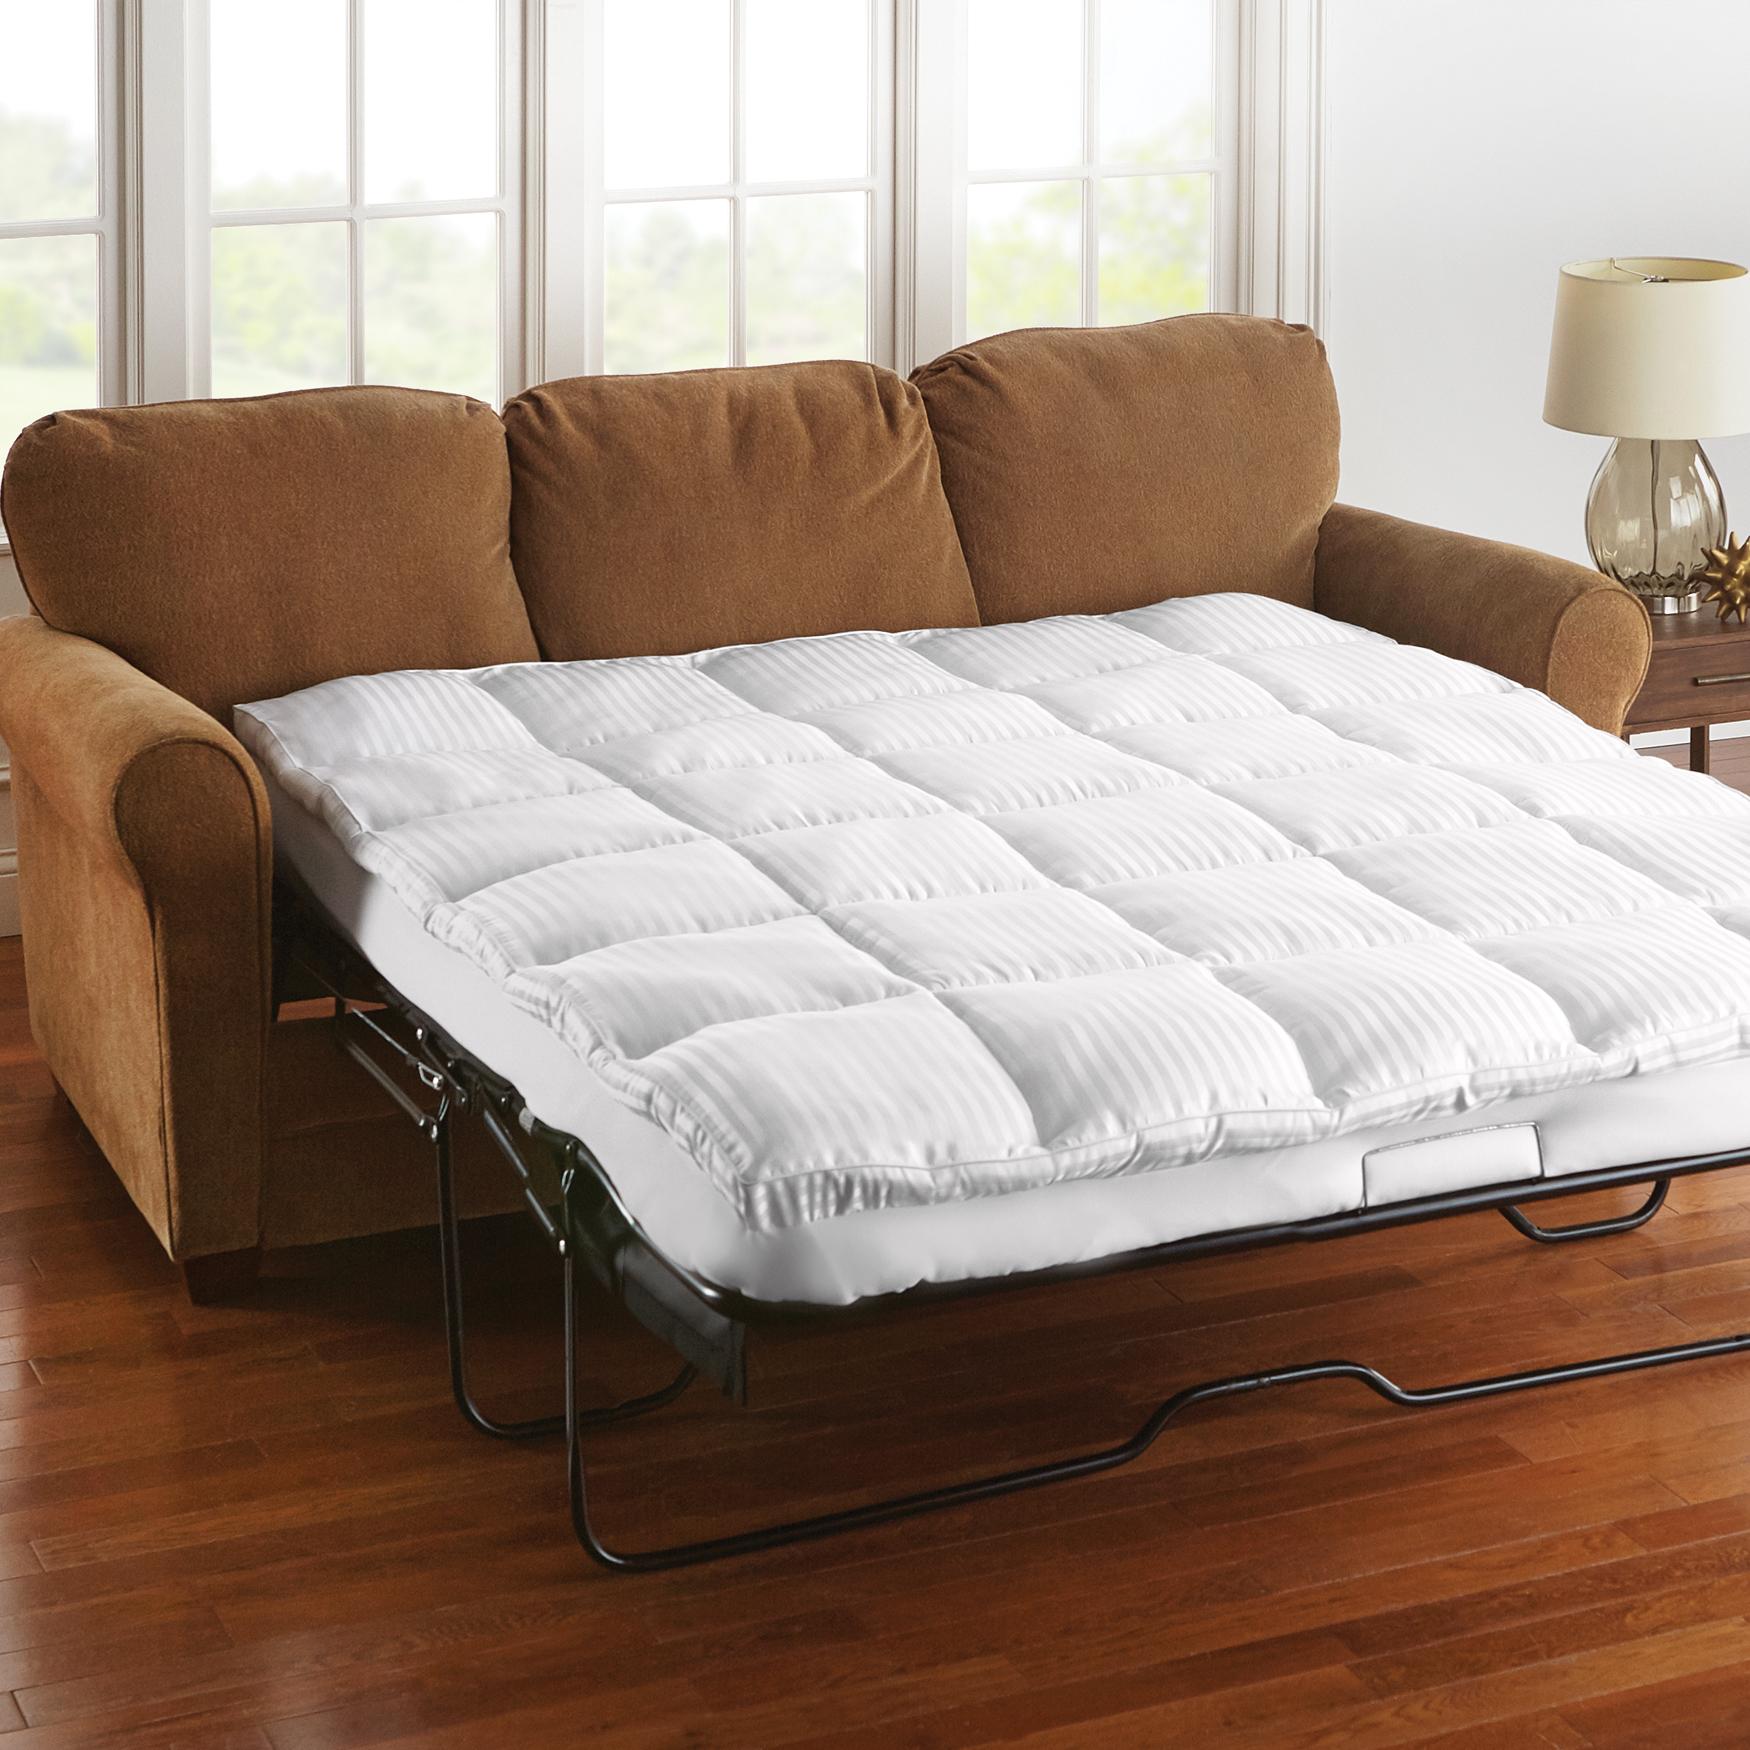 sofa sleeper mattress pad garden uk bed topper plus size pads